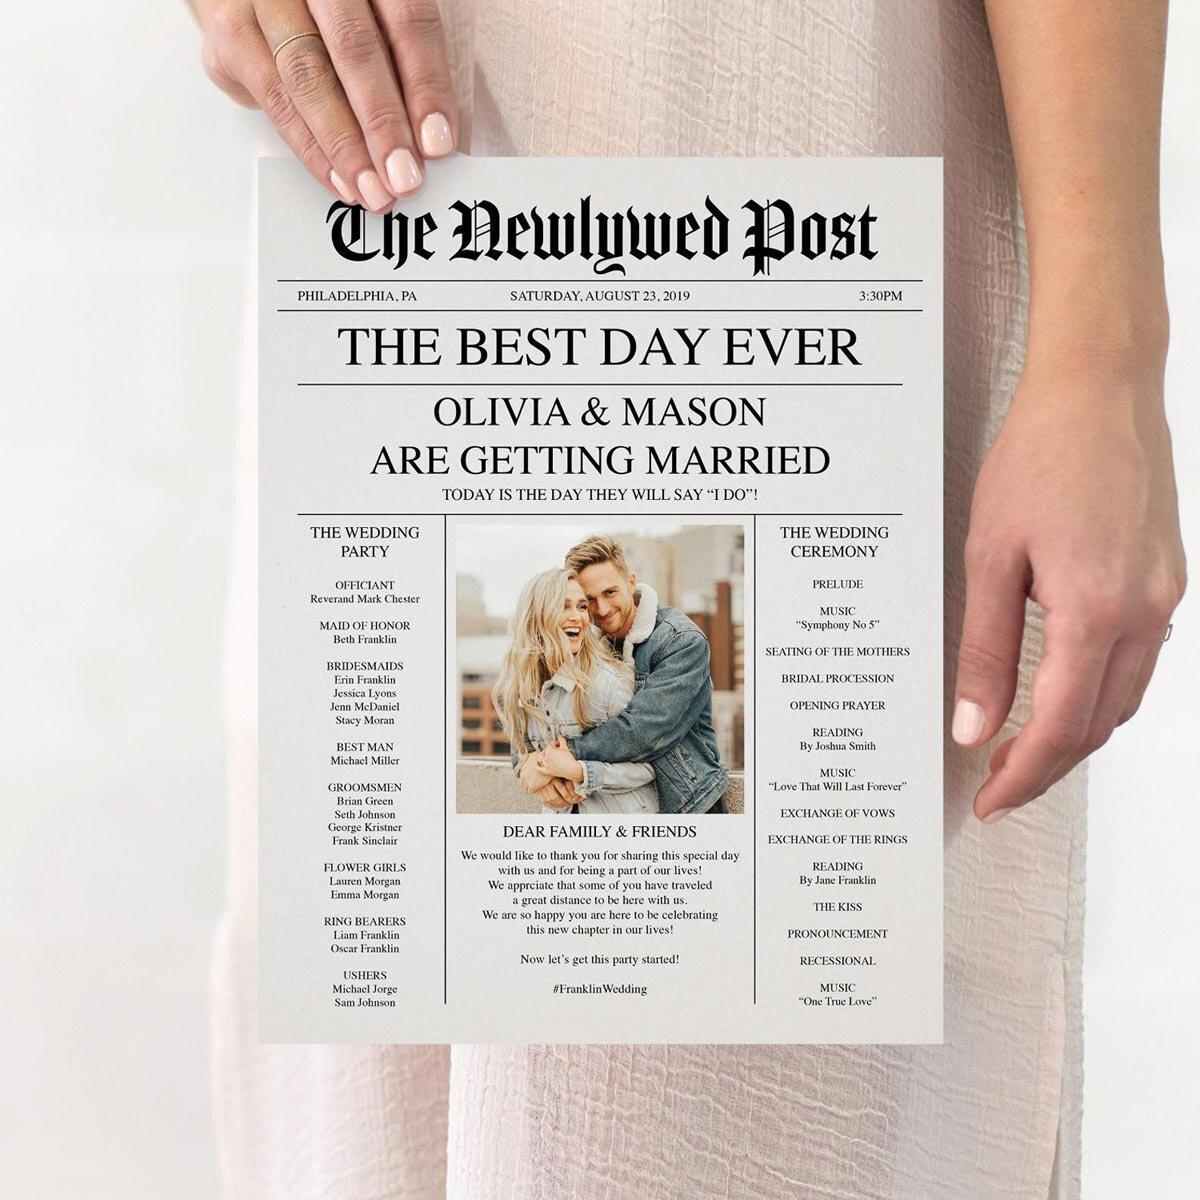 Unique Newspaper Wedding Program The Wedding Times large 4 page program